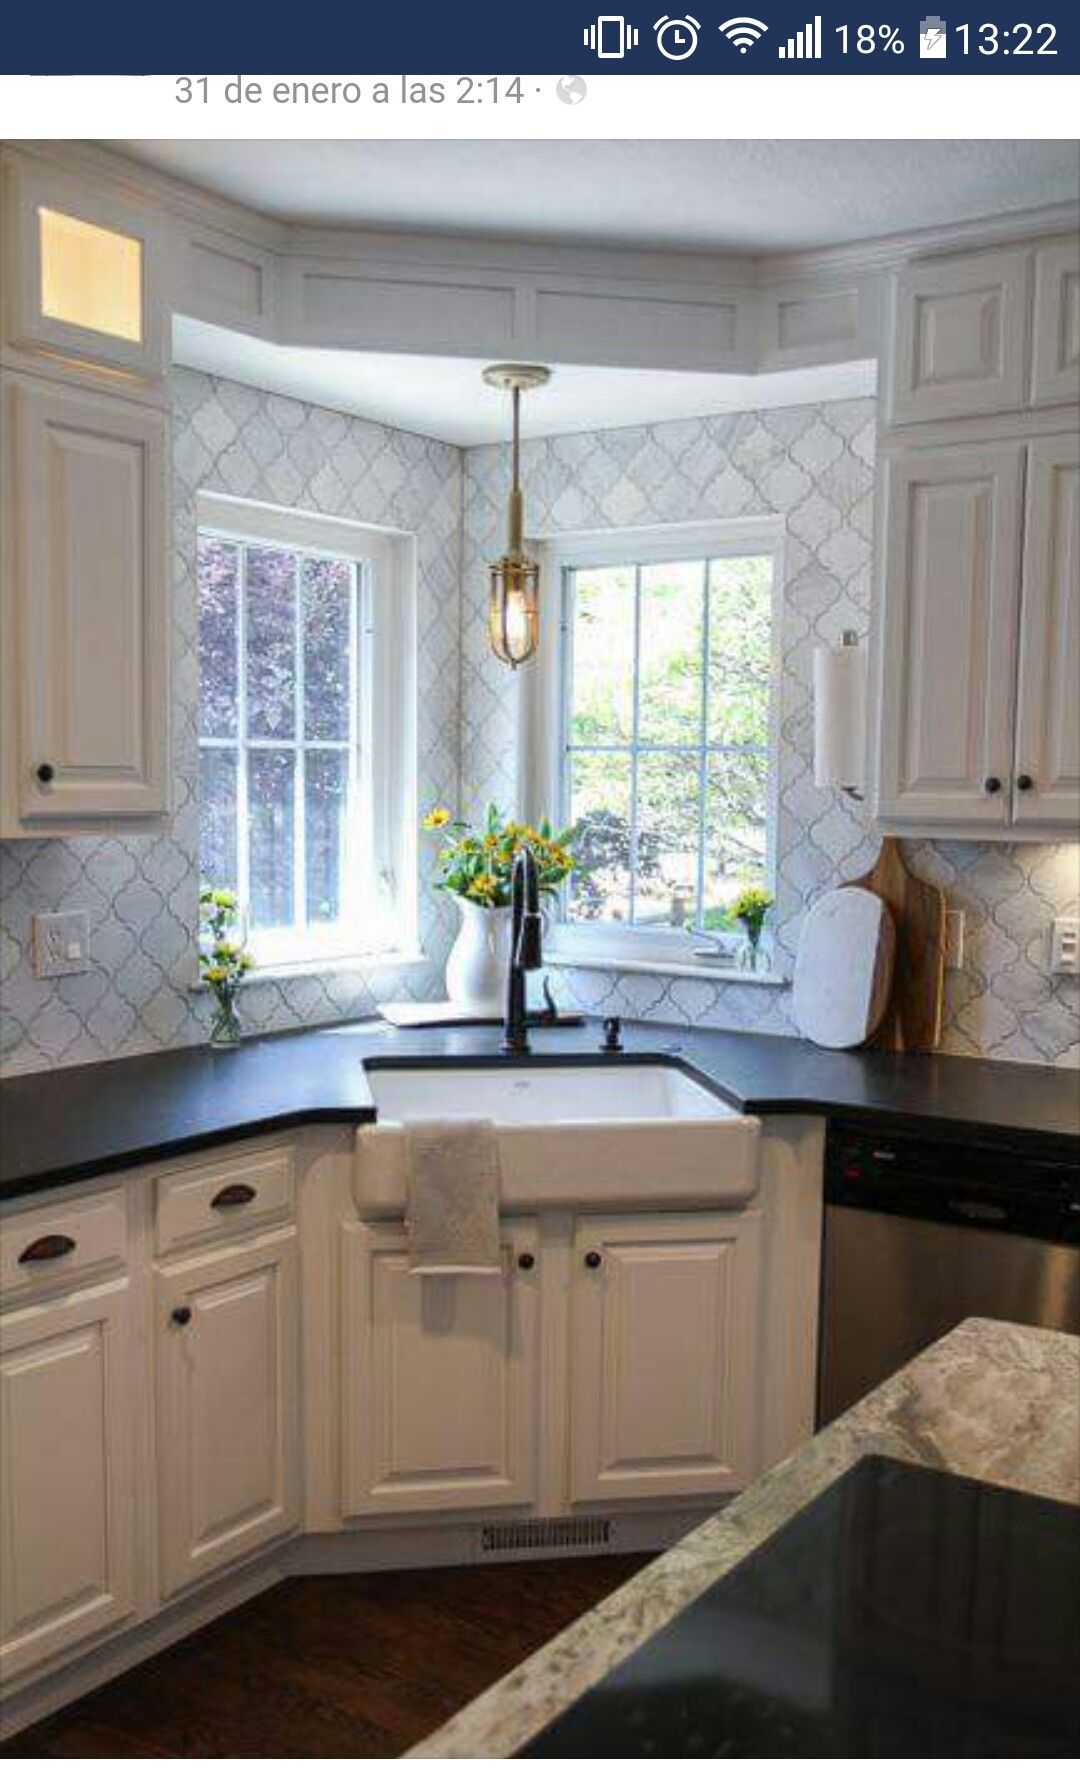 corner farmhouse sink havenly in 2019 corner sink kitchen kitchen farmhouse kitchen cabinets on kitchen cabinets corner id=41048